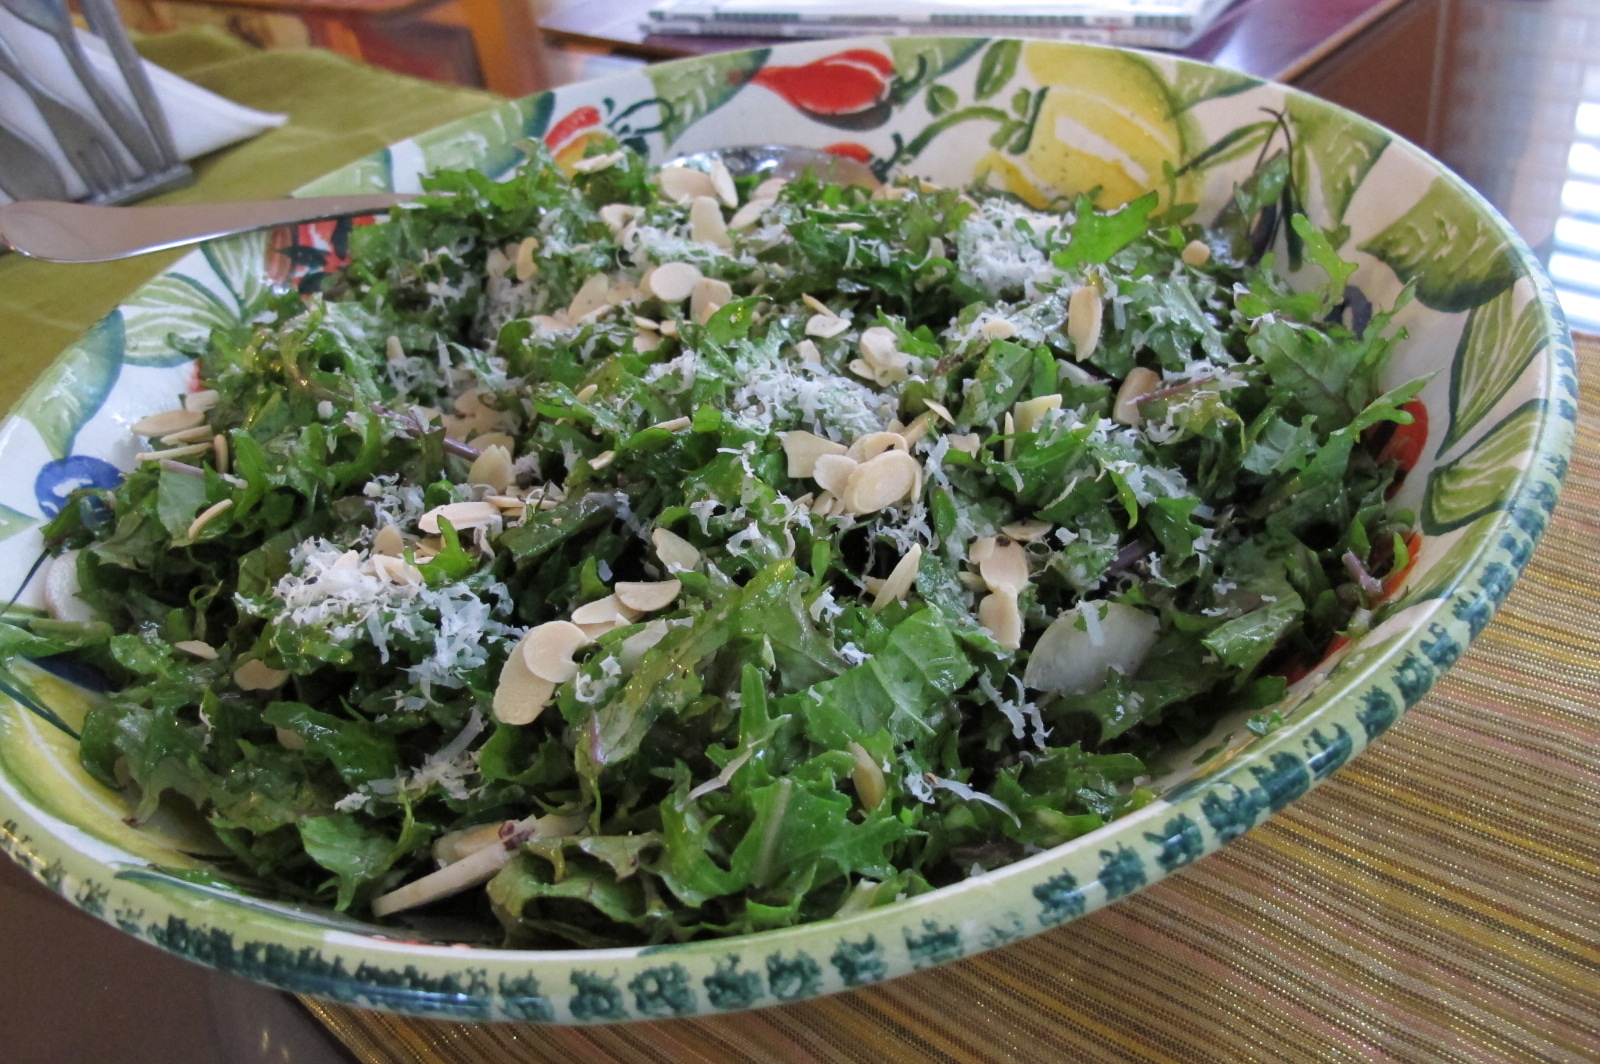 Lemon Zested Kale Salad with Pecorino Cheese